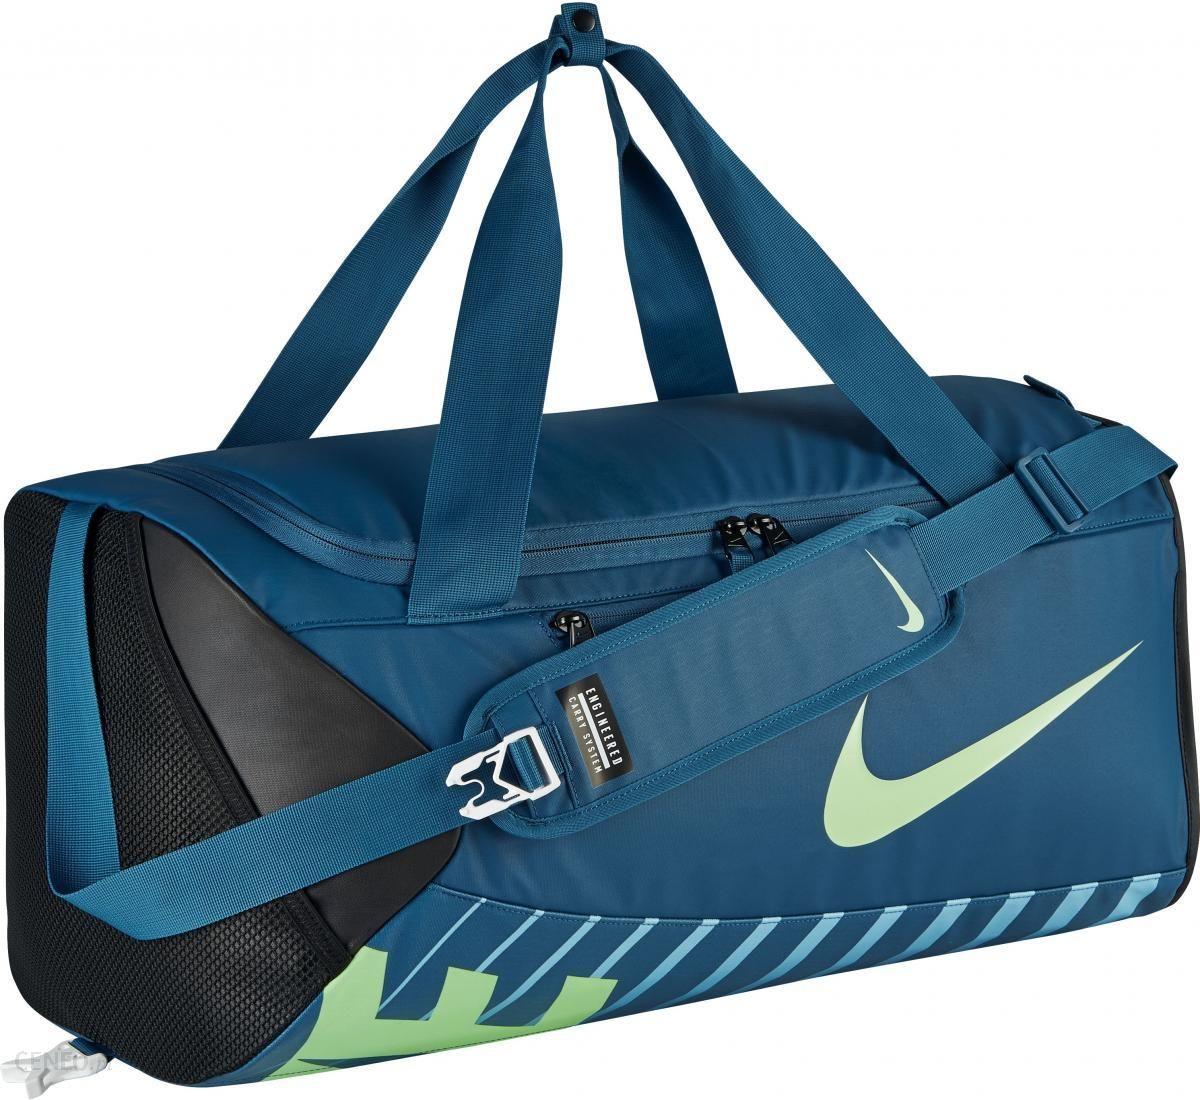 db9b5dfb687e2 Torba Nike Alpha Adapt Crossbody (medium) niebieskie BA5182-458 - zdjęcie 1